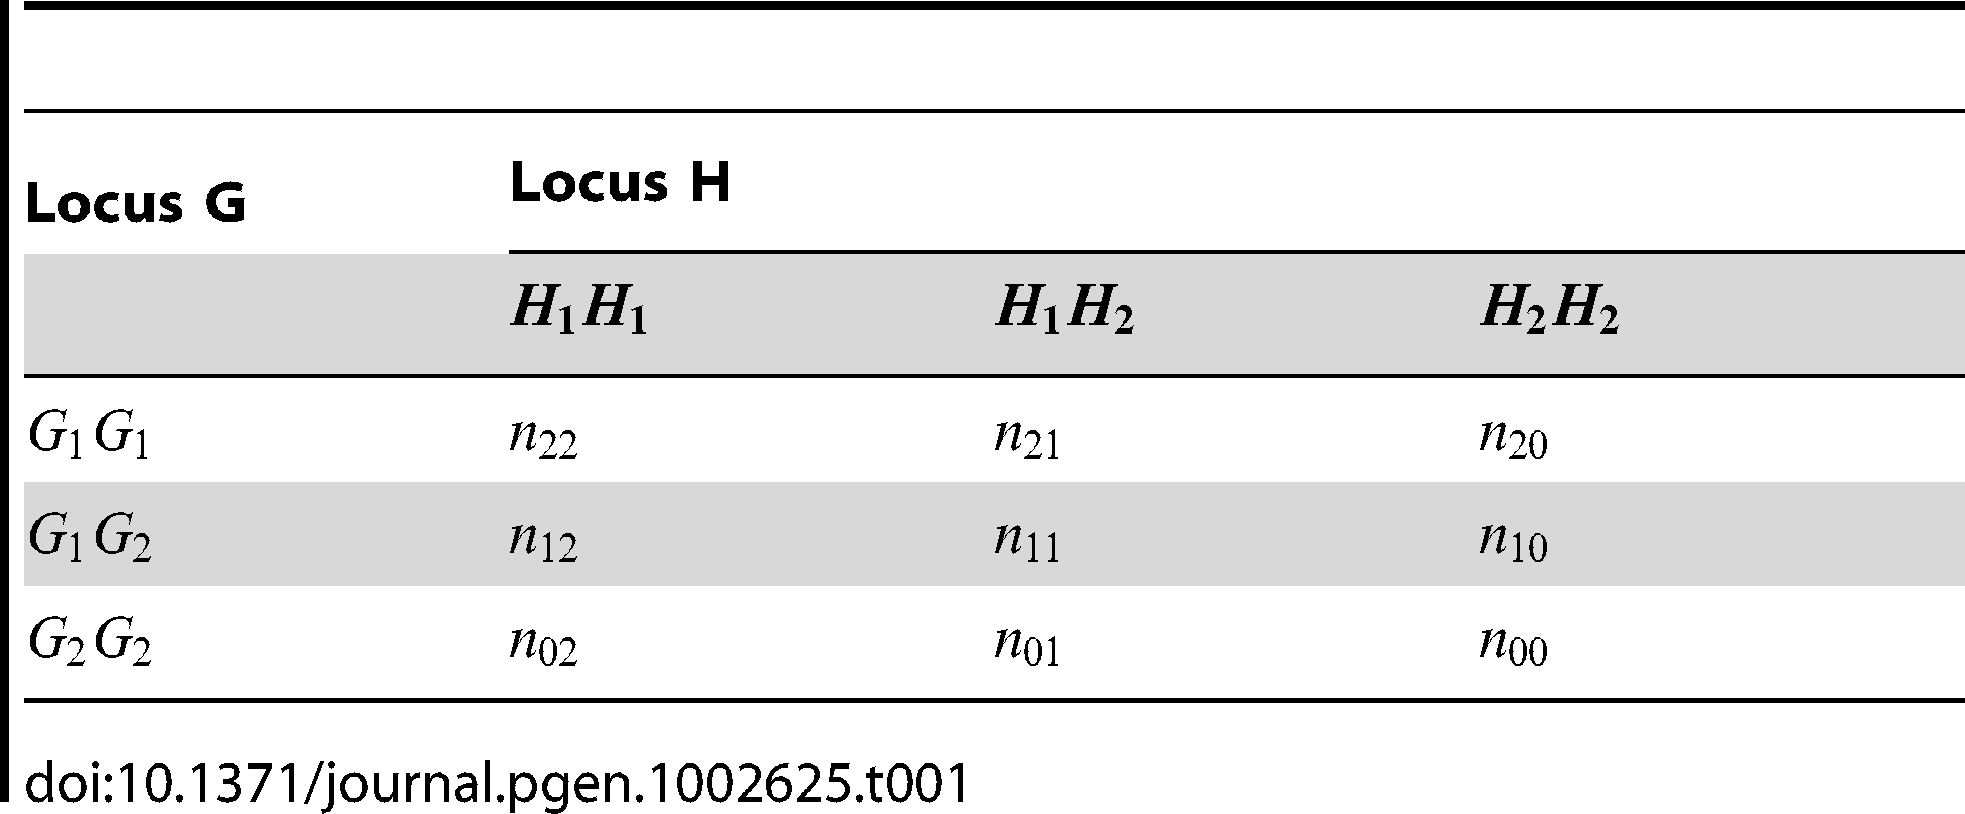 Multilocus genotype counts at two SNPs in a set of genotyped individuals.